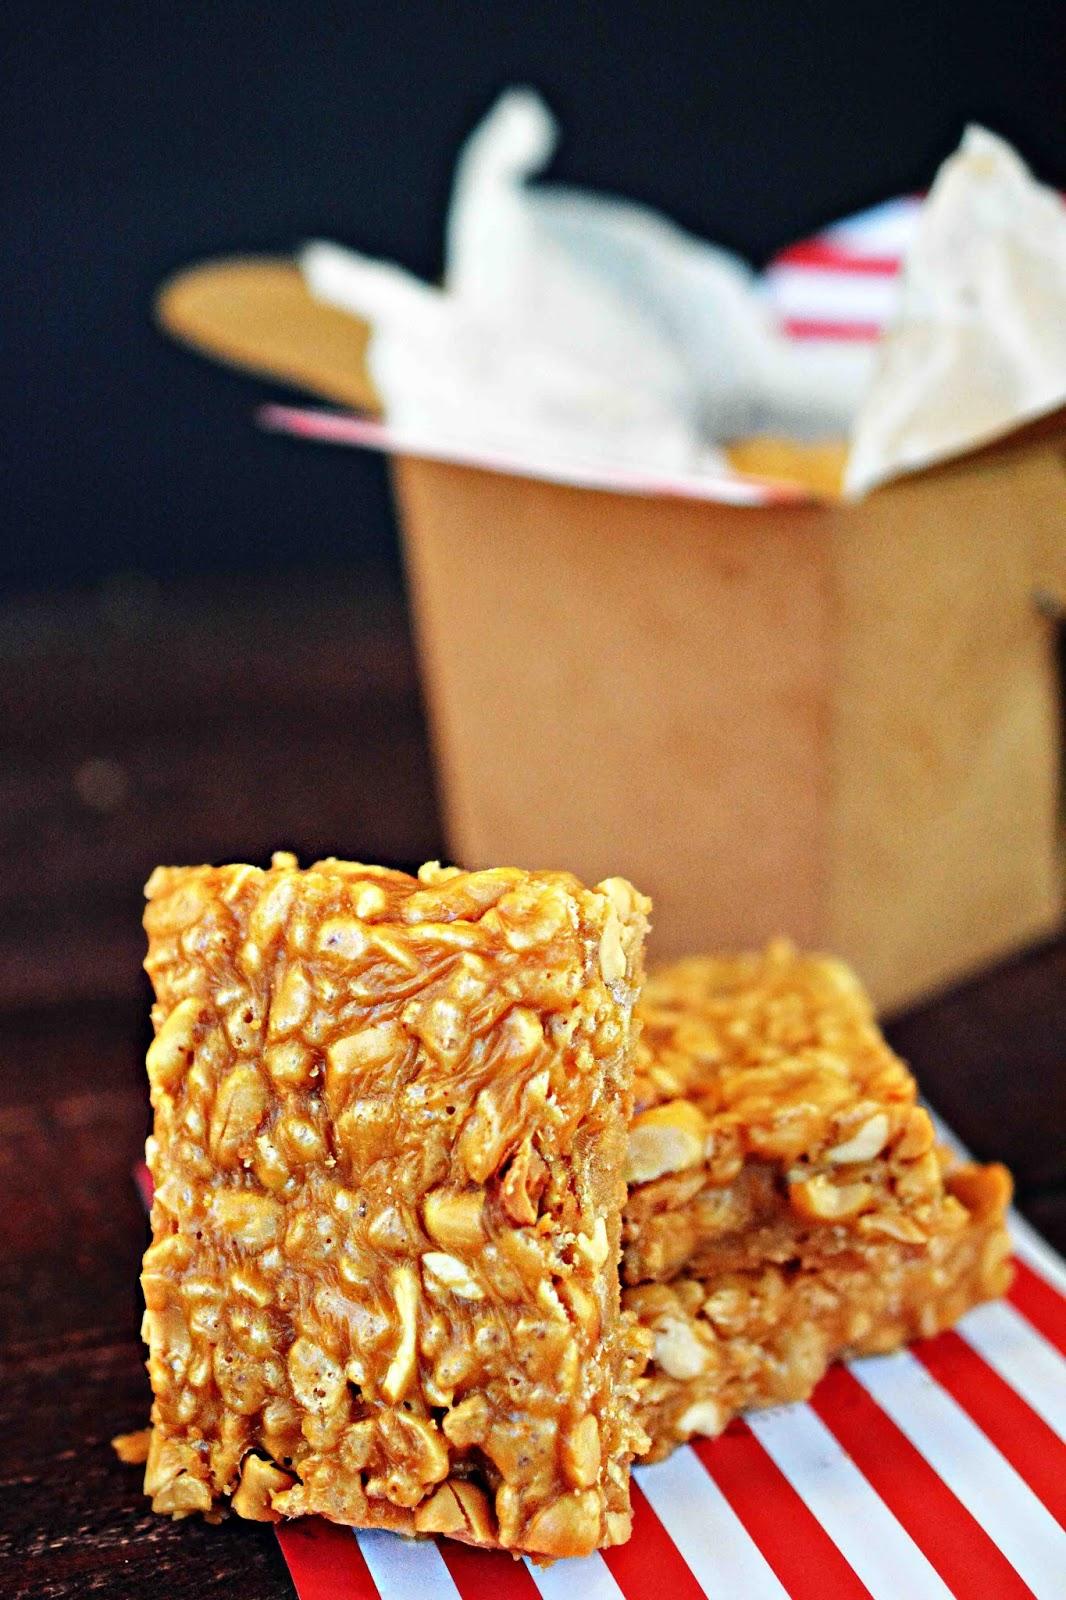 peanut candy bar